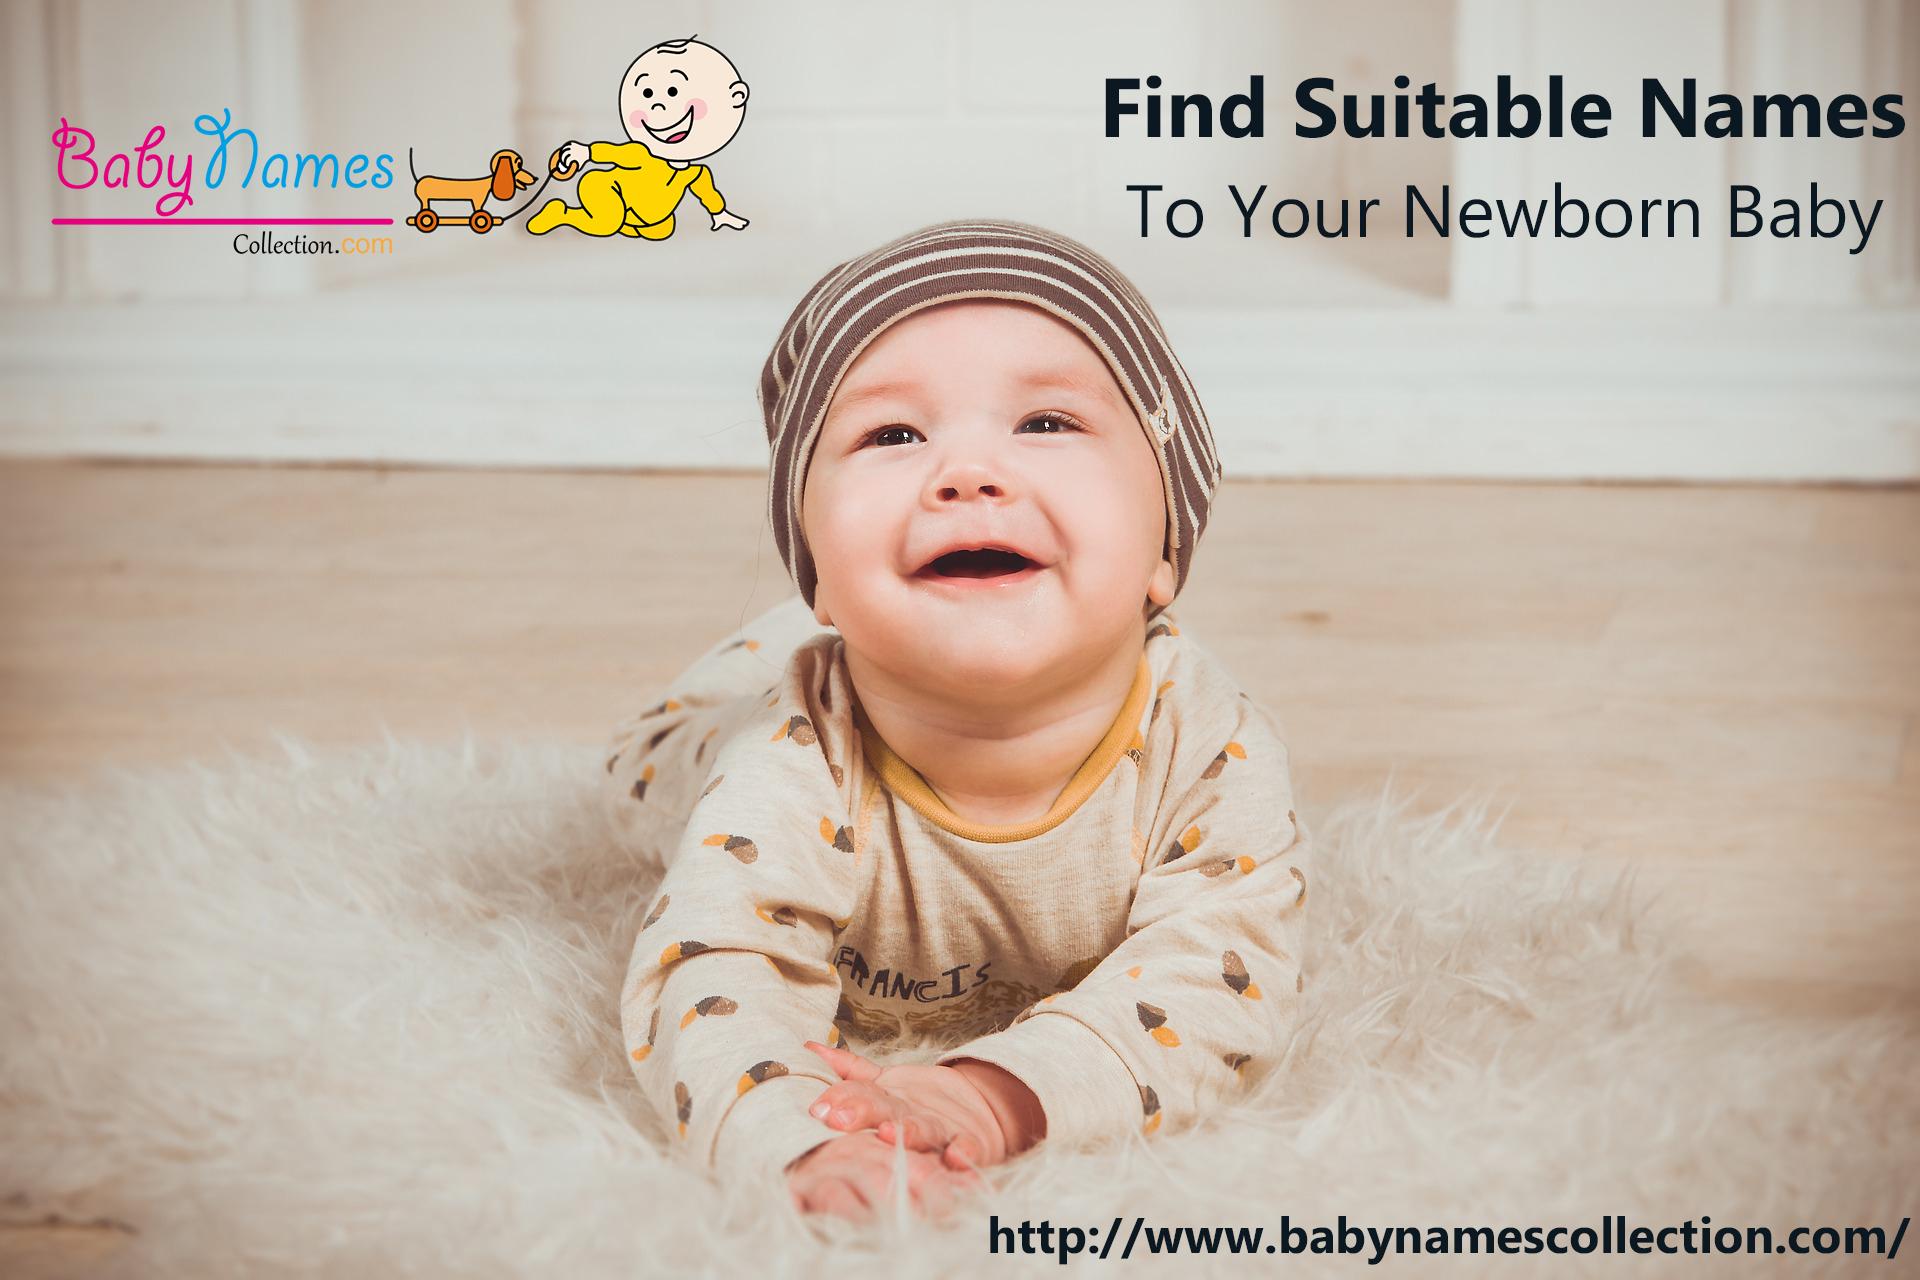 Tag: ato-z-modern-baby-names-by-rashi • BookLikes